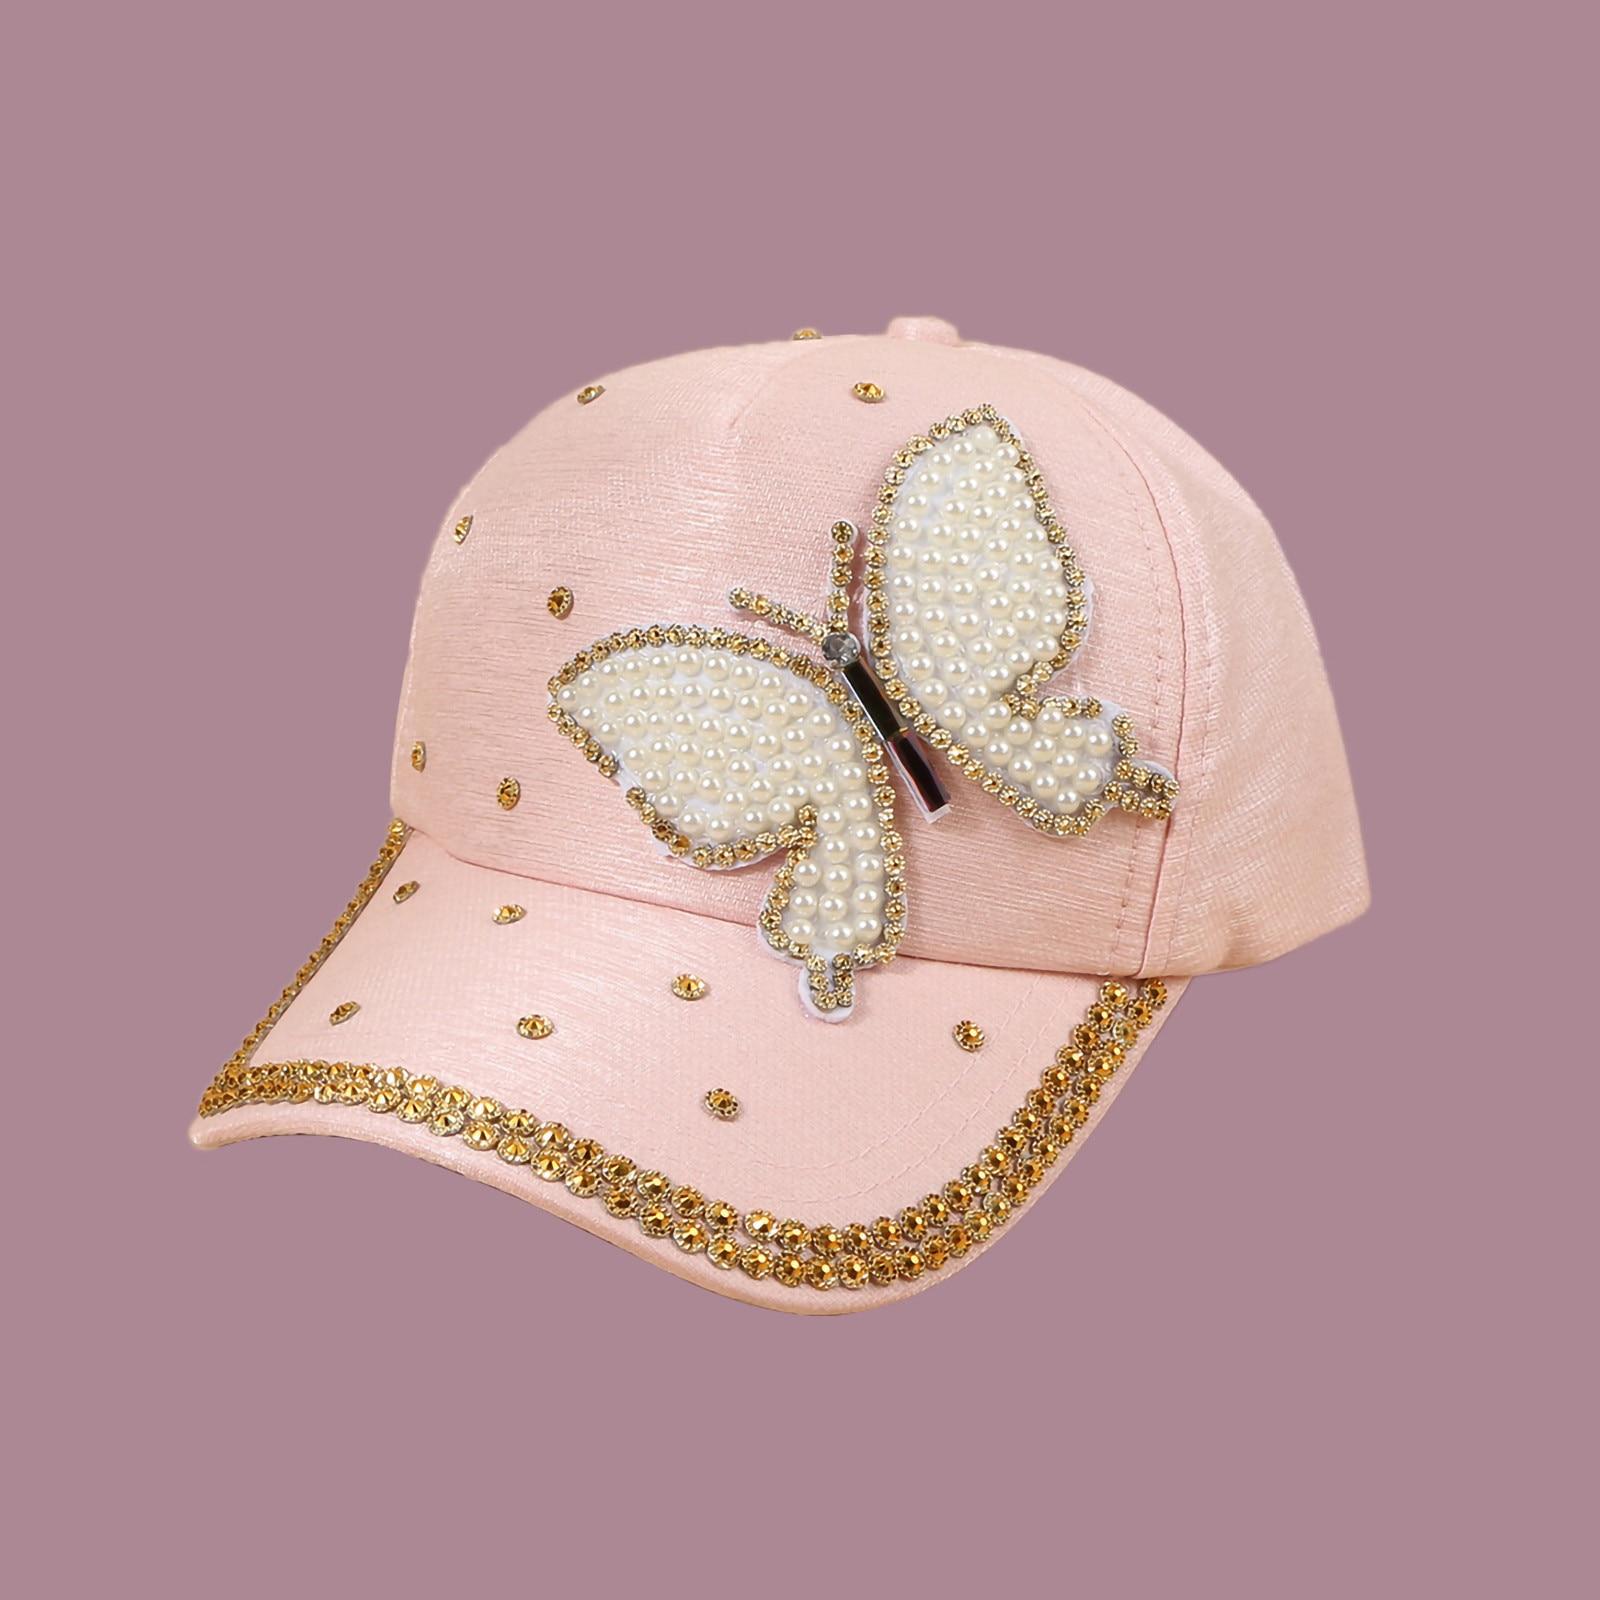 2021 Summer Outdoors Visors Hat Fashion Lovely Women's Hat Sequined Butterfly Baseball Cap Shading Hip Hop Cap Hat Sun Cap#3